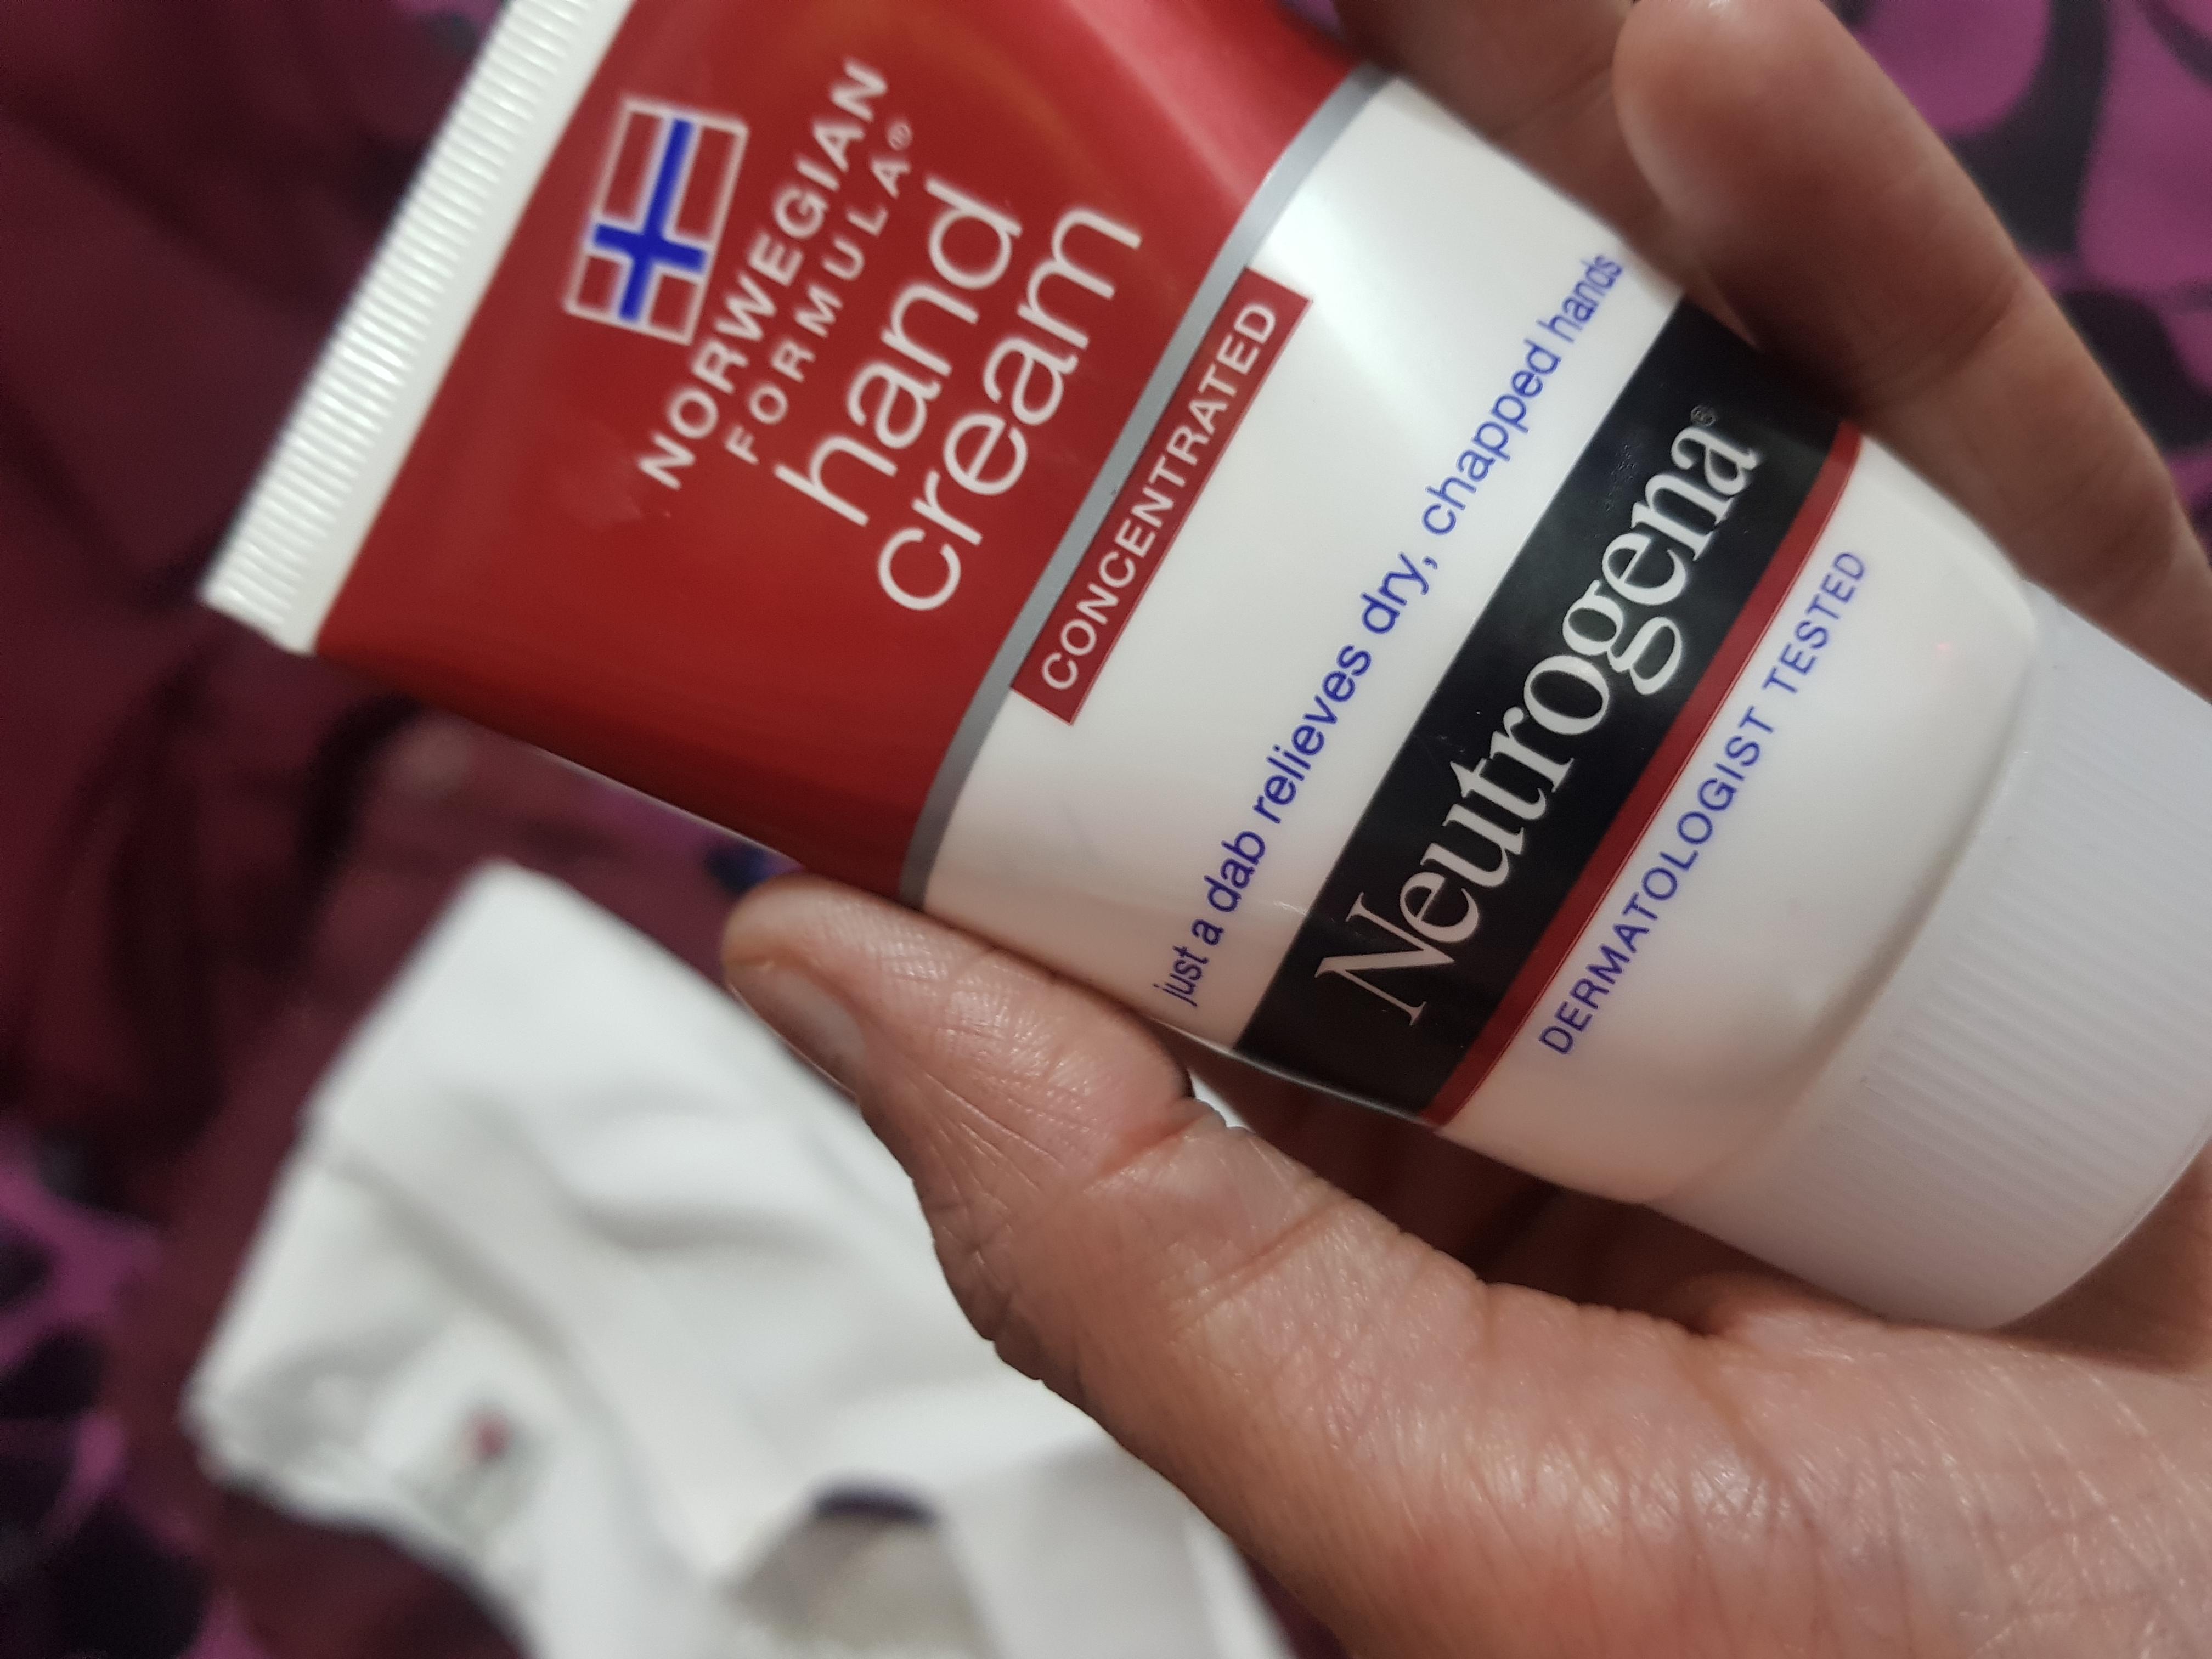 Neutrogena Norwegian Formula Hand Cream-Say bye bye to chapped hands!-By poonam_kakkar